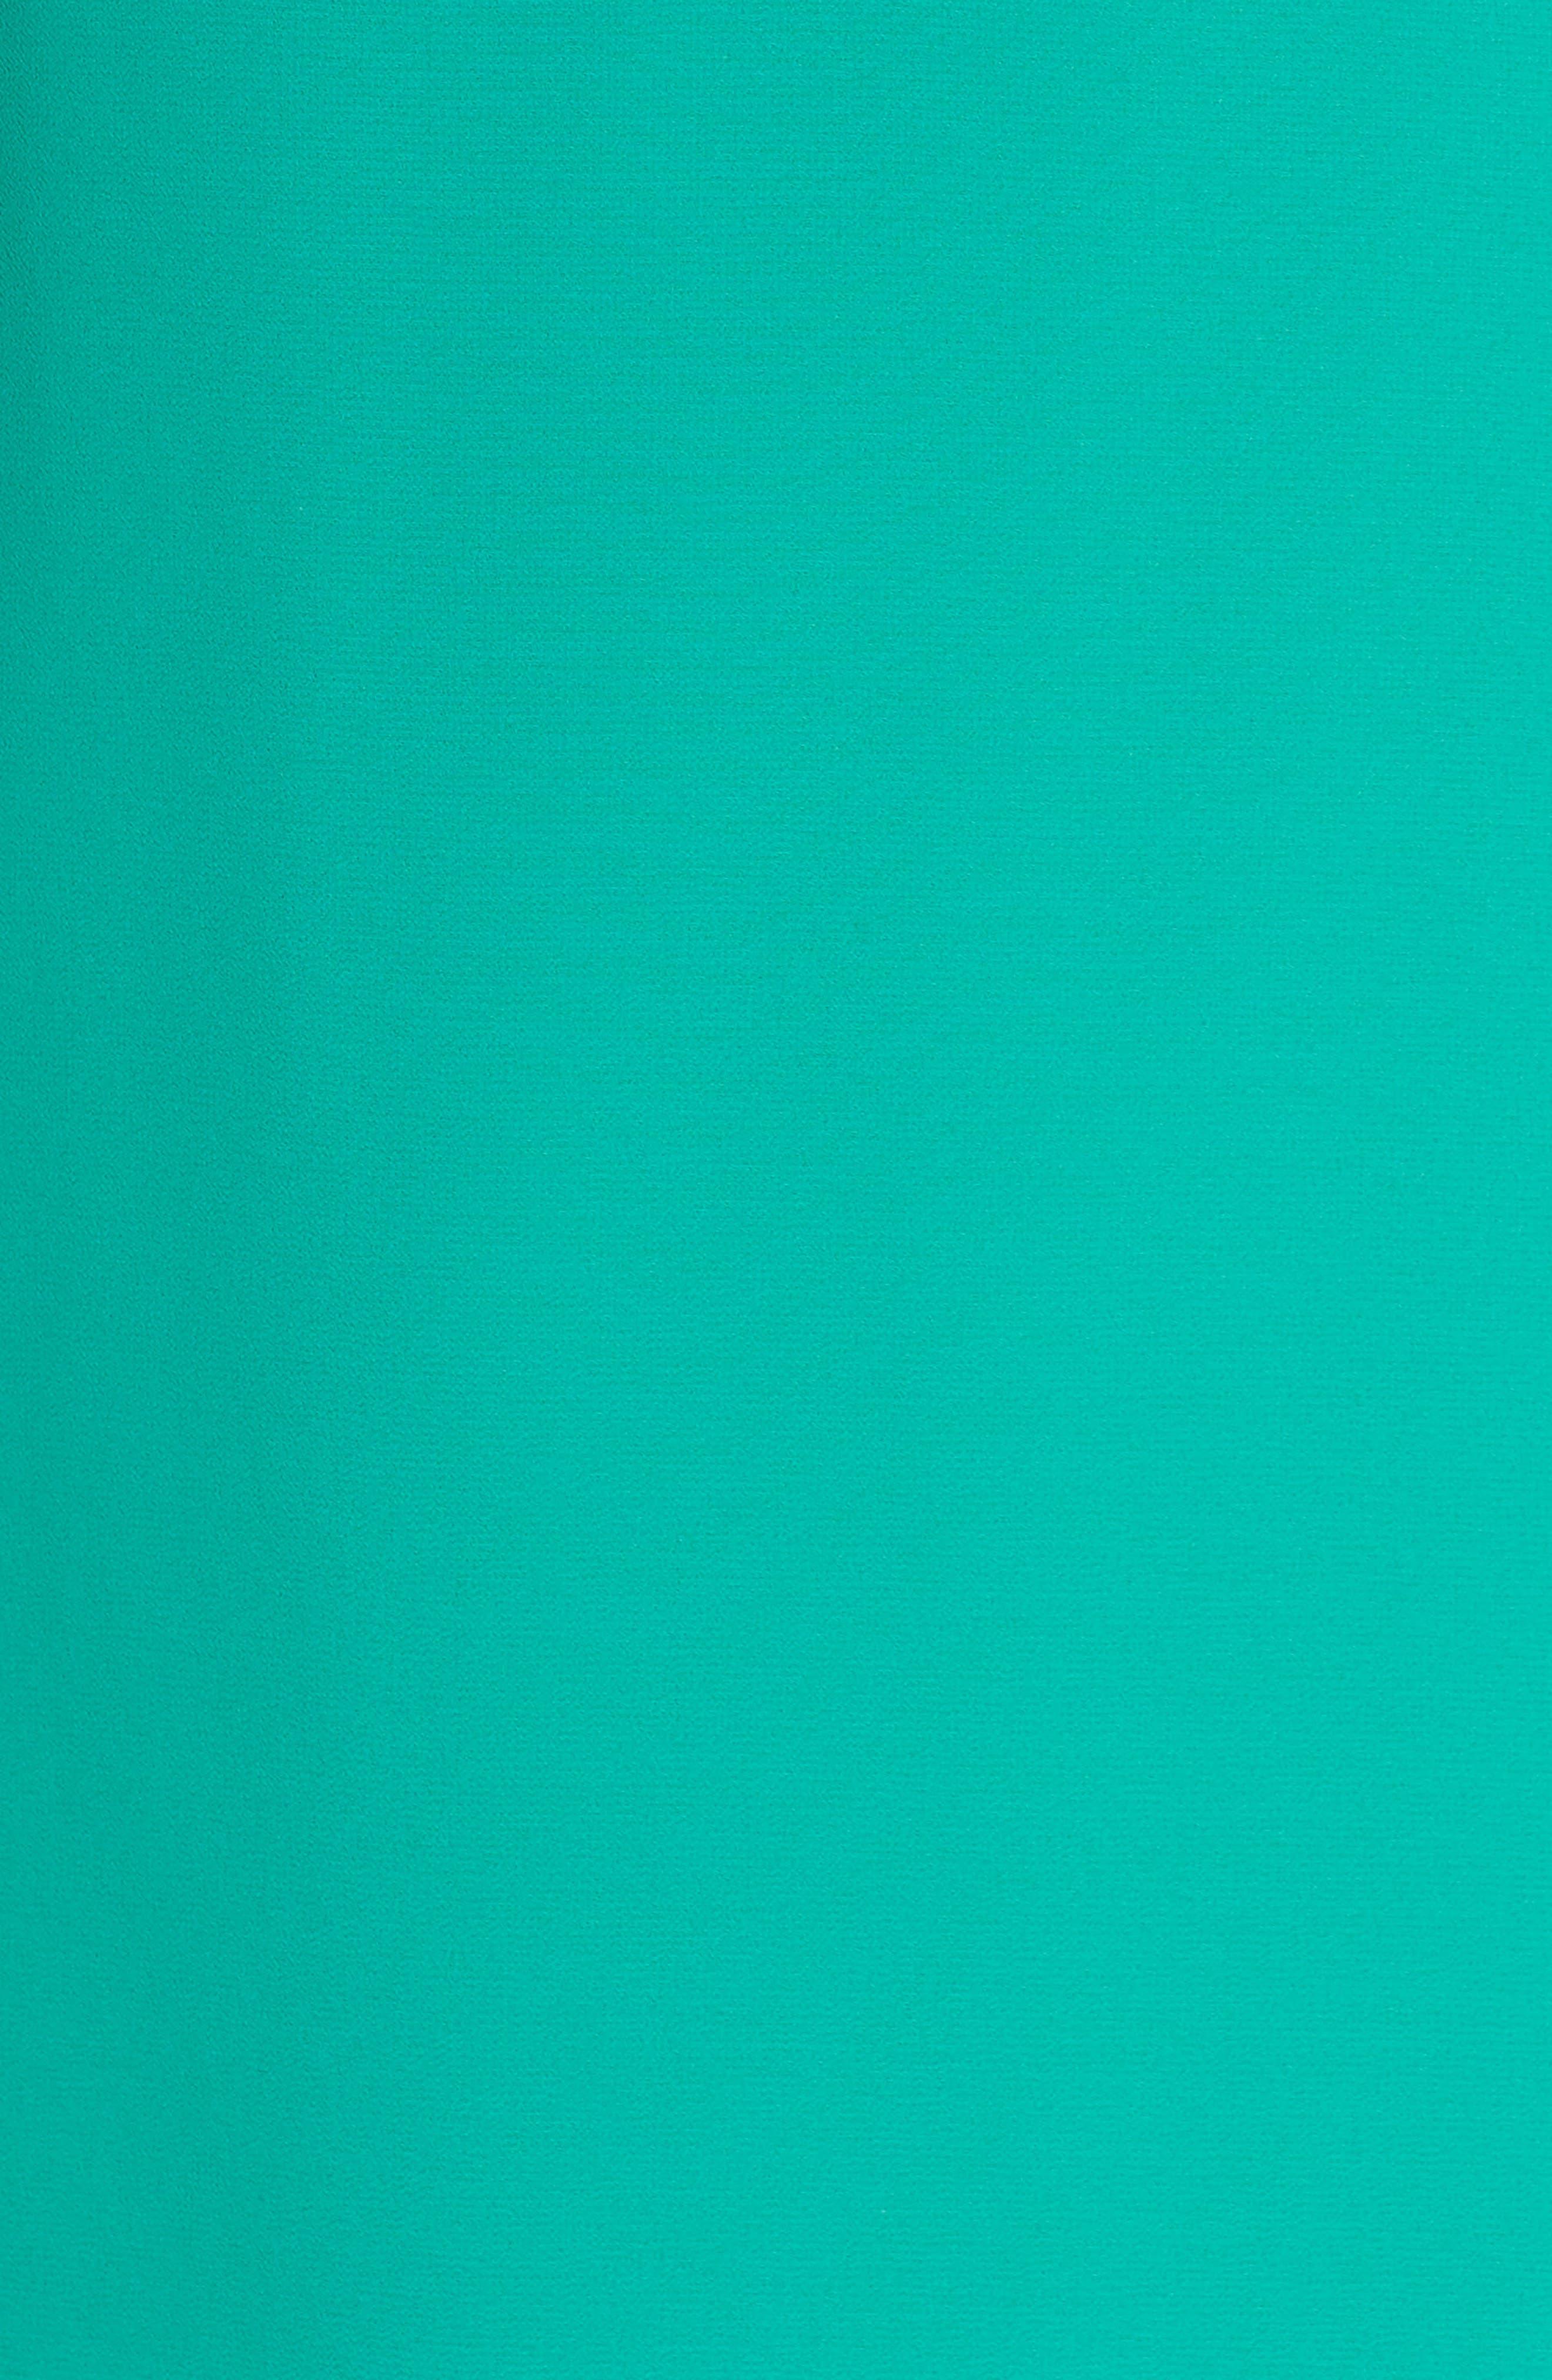 Soufflé Ruffle Chiffon Shift Dress,                             Alternate thumbnail 6, color,                             Green